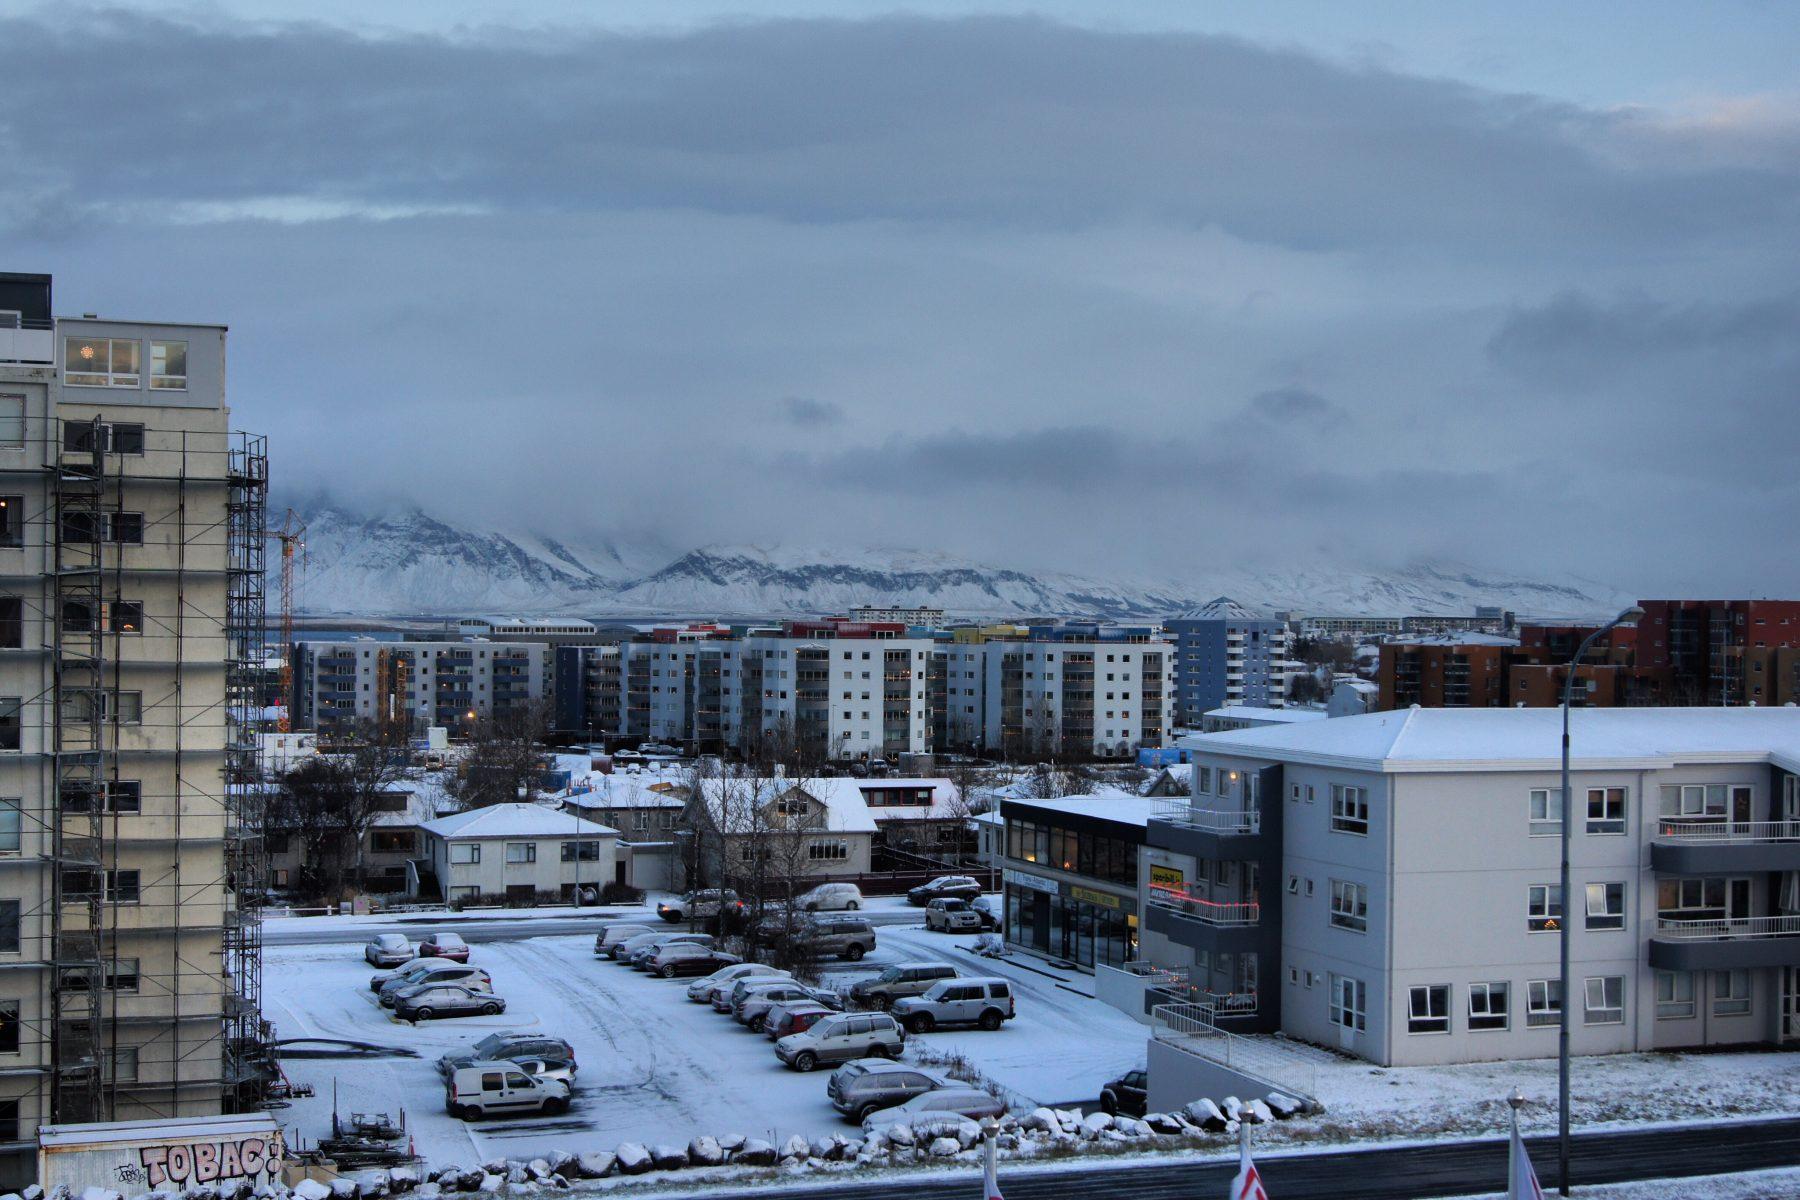 Sleeping in a Pod in Iceland - Galaxy Pod Hostel - Exploring Kiwis